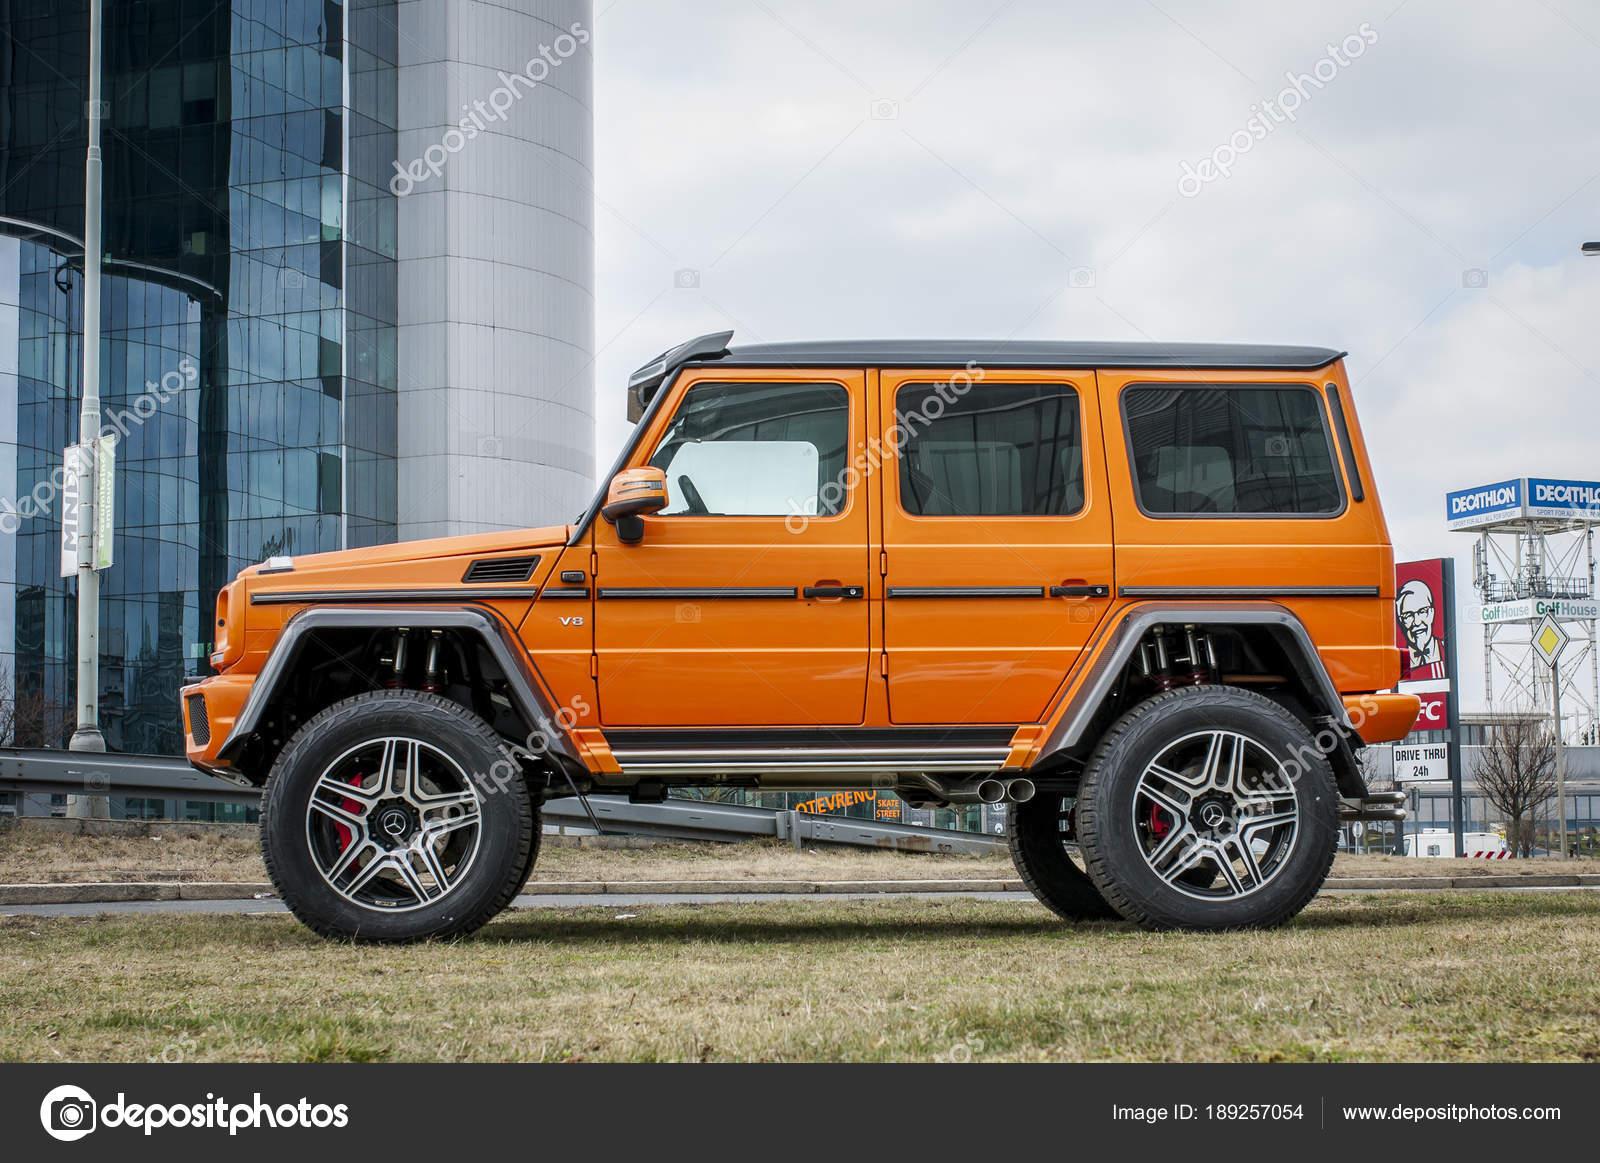 Mercedes Benz G500 4x4 in orange color – Stock Editorial